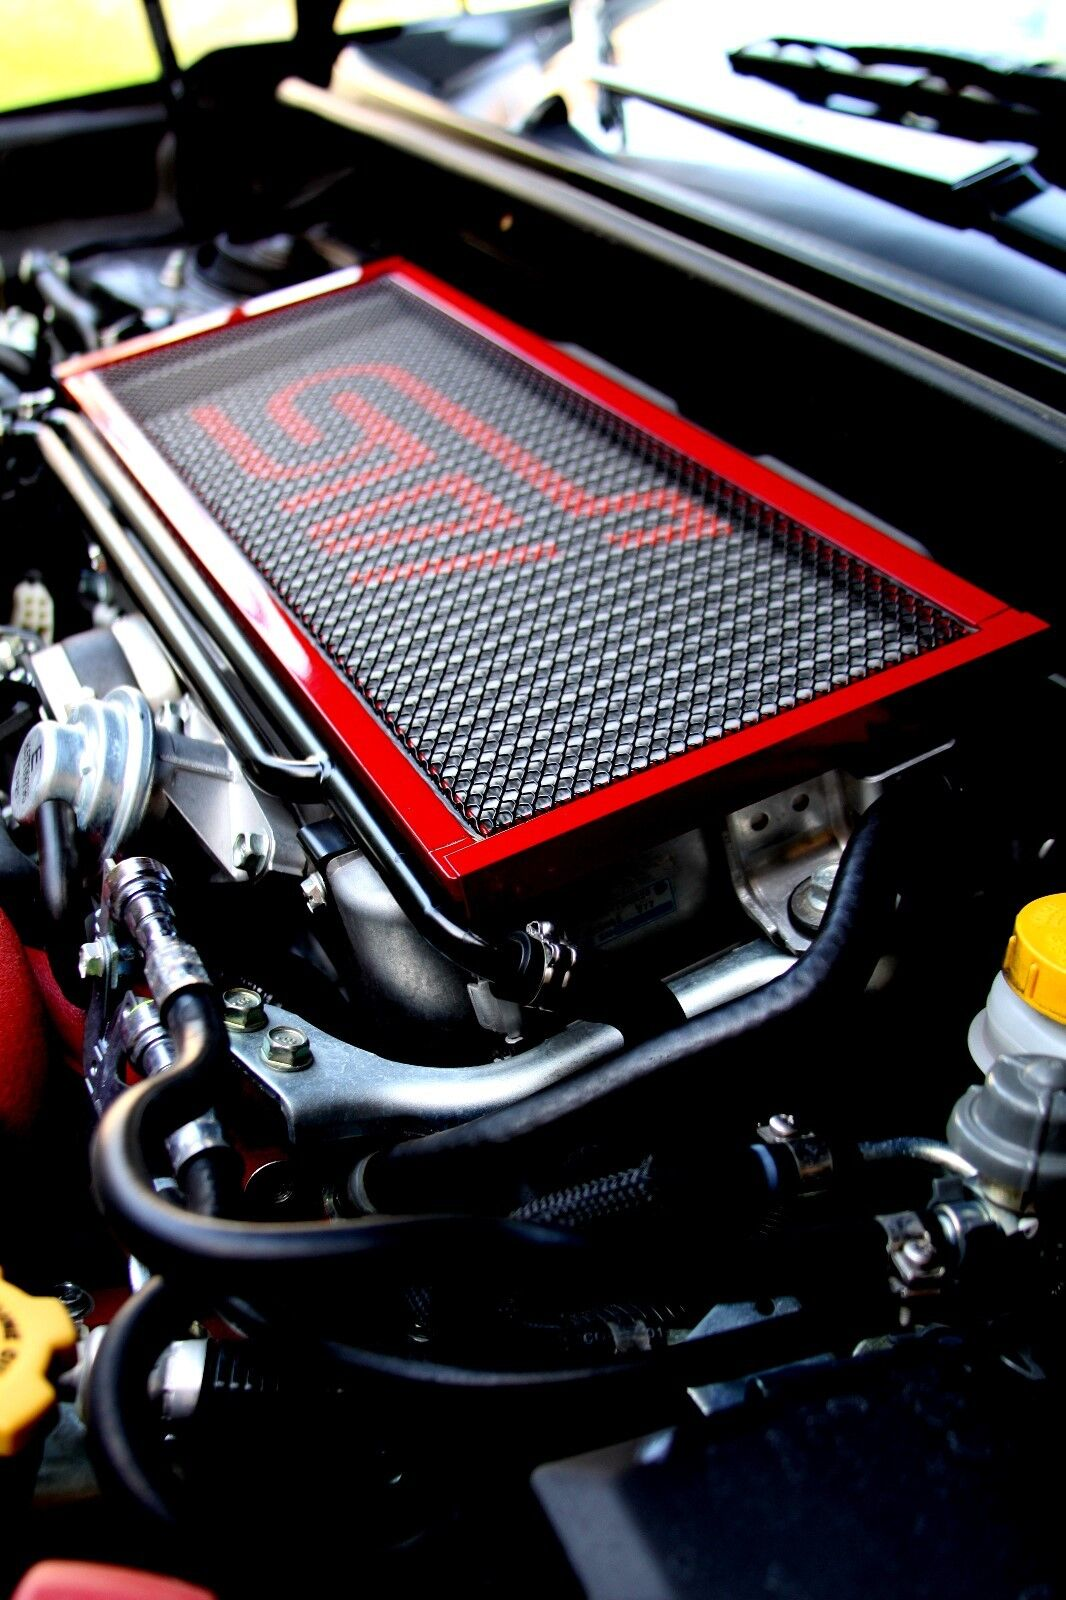 intercooler sti subaru wrx screen guard tmic 2008 protector avt screens turbo engine impreza parts boot